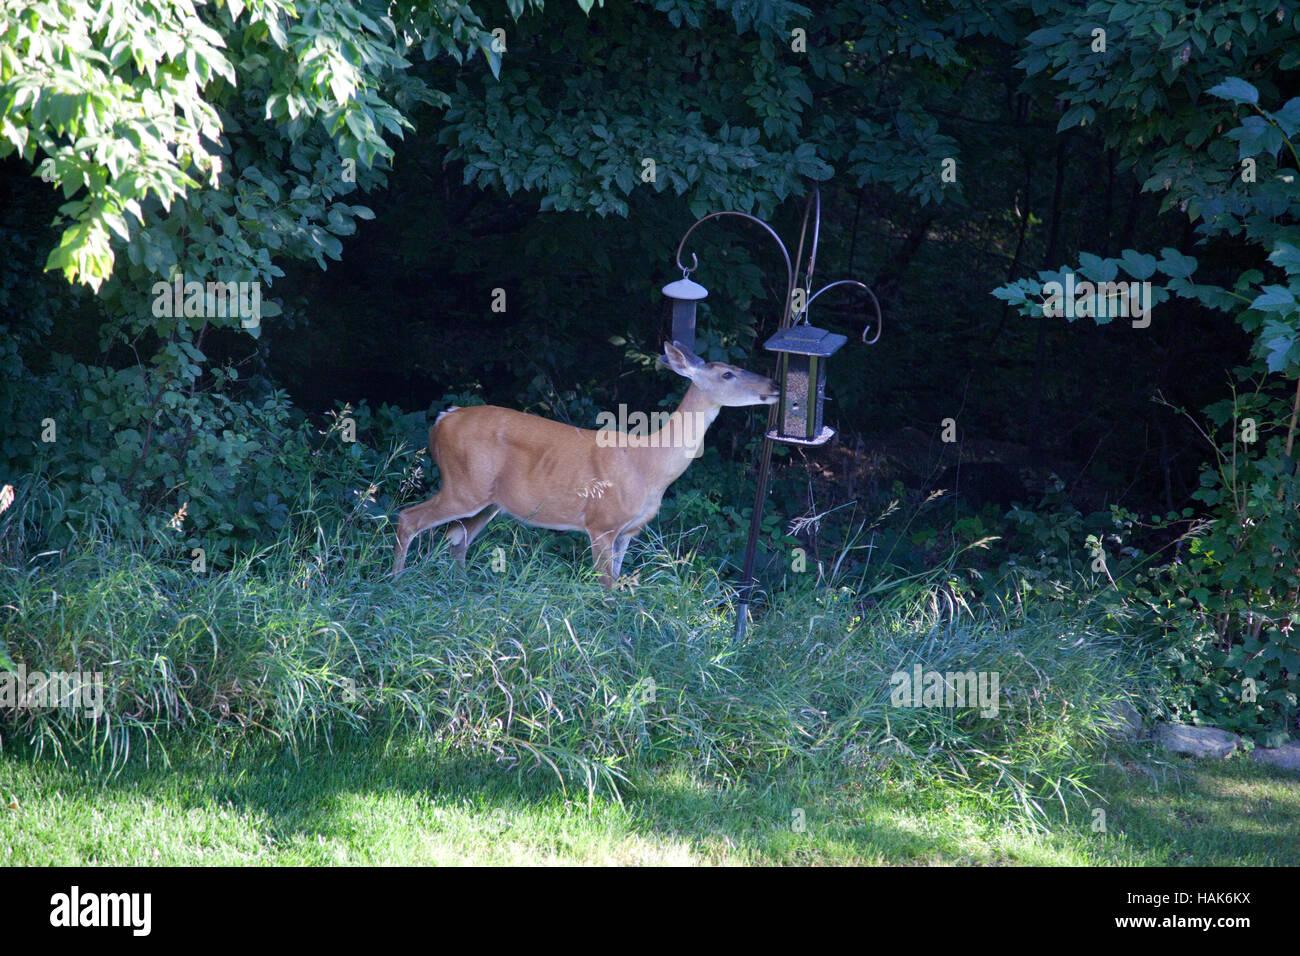 Doe deer eating from a backyard bird feeder. Champlin Minnesota MN USA - Stock Image